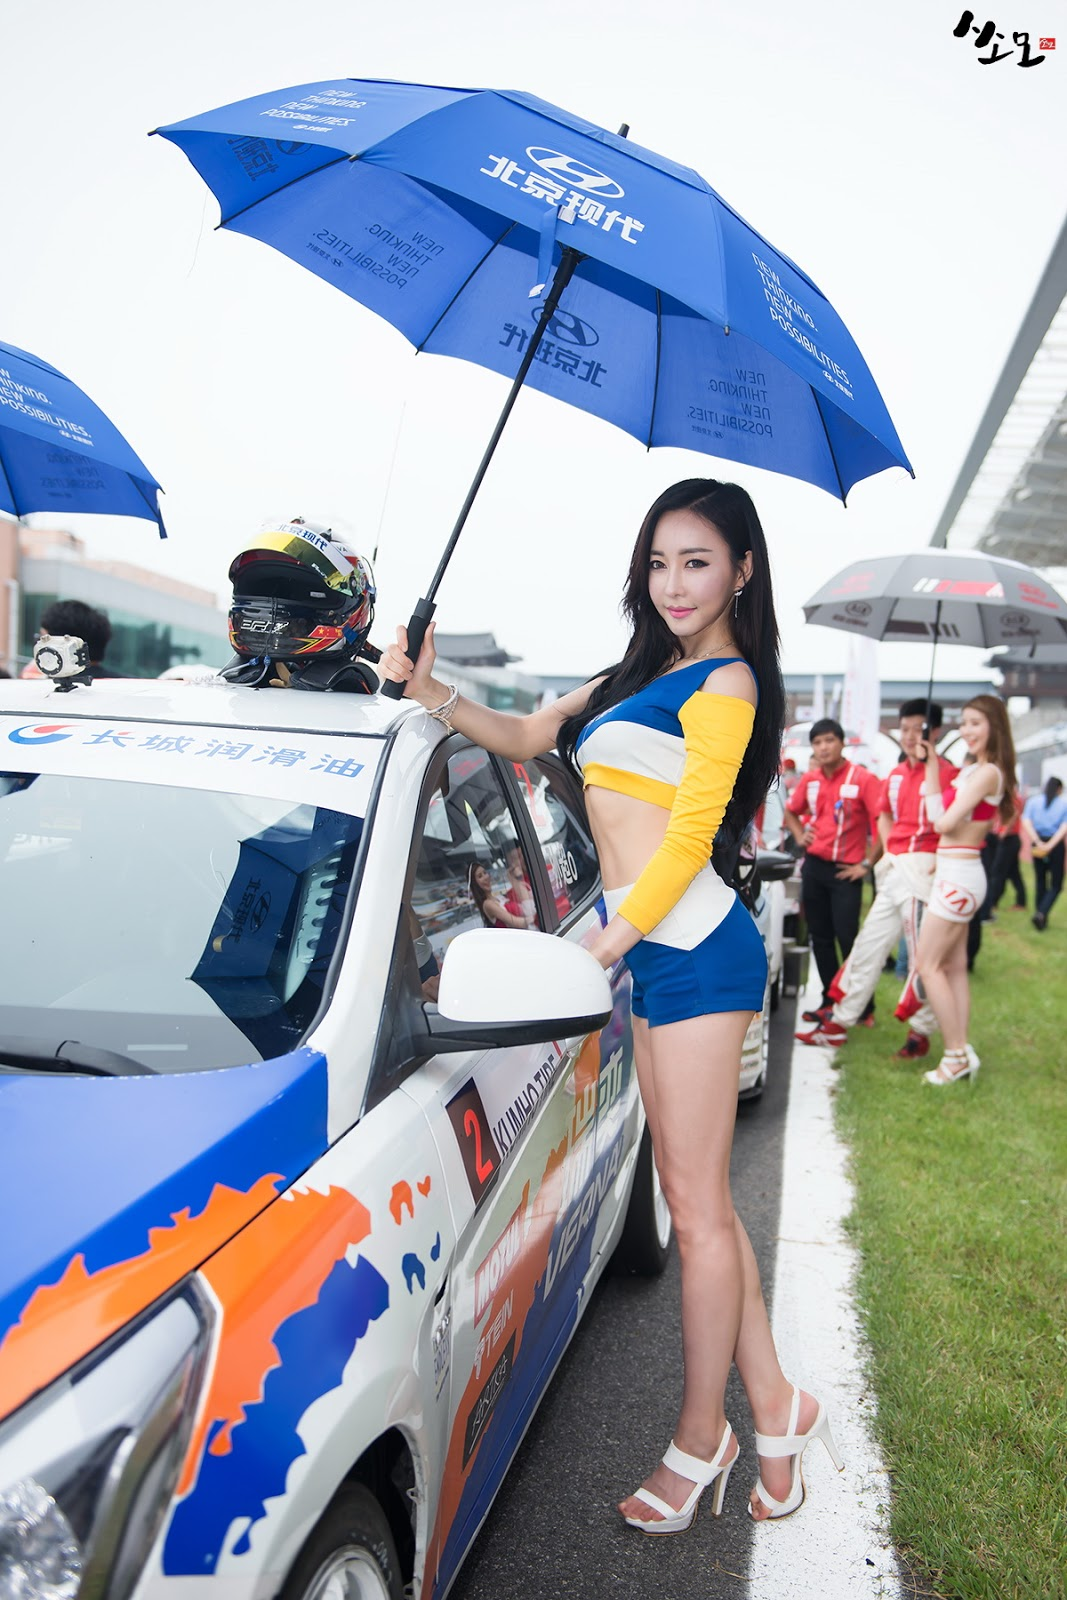 Ahn hye jin korean woman bj streaming car sex with step oppa link full httpgobalnewsxyzwx7y8wt - 4 4